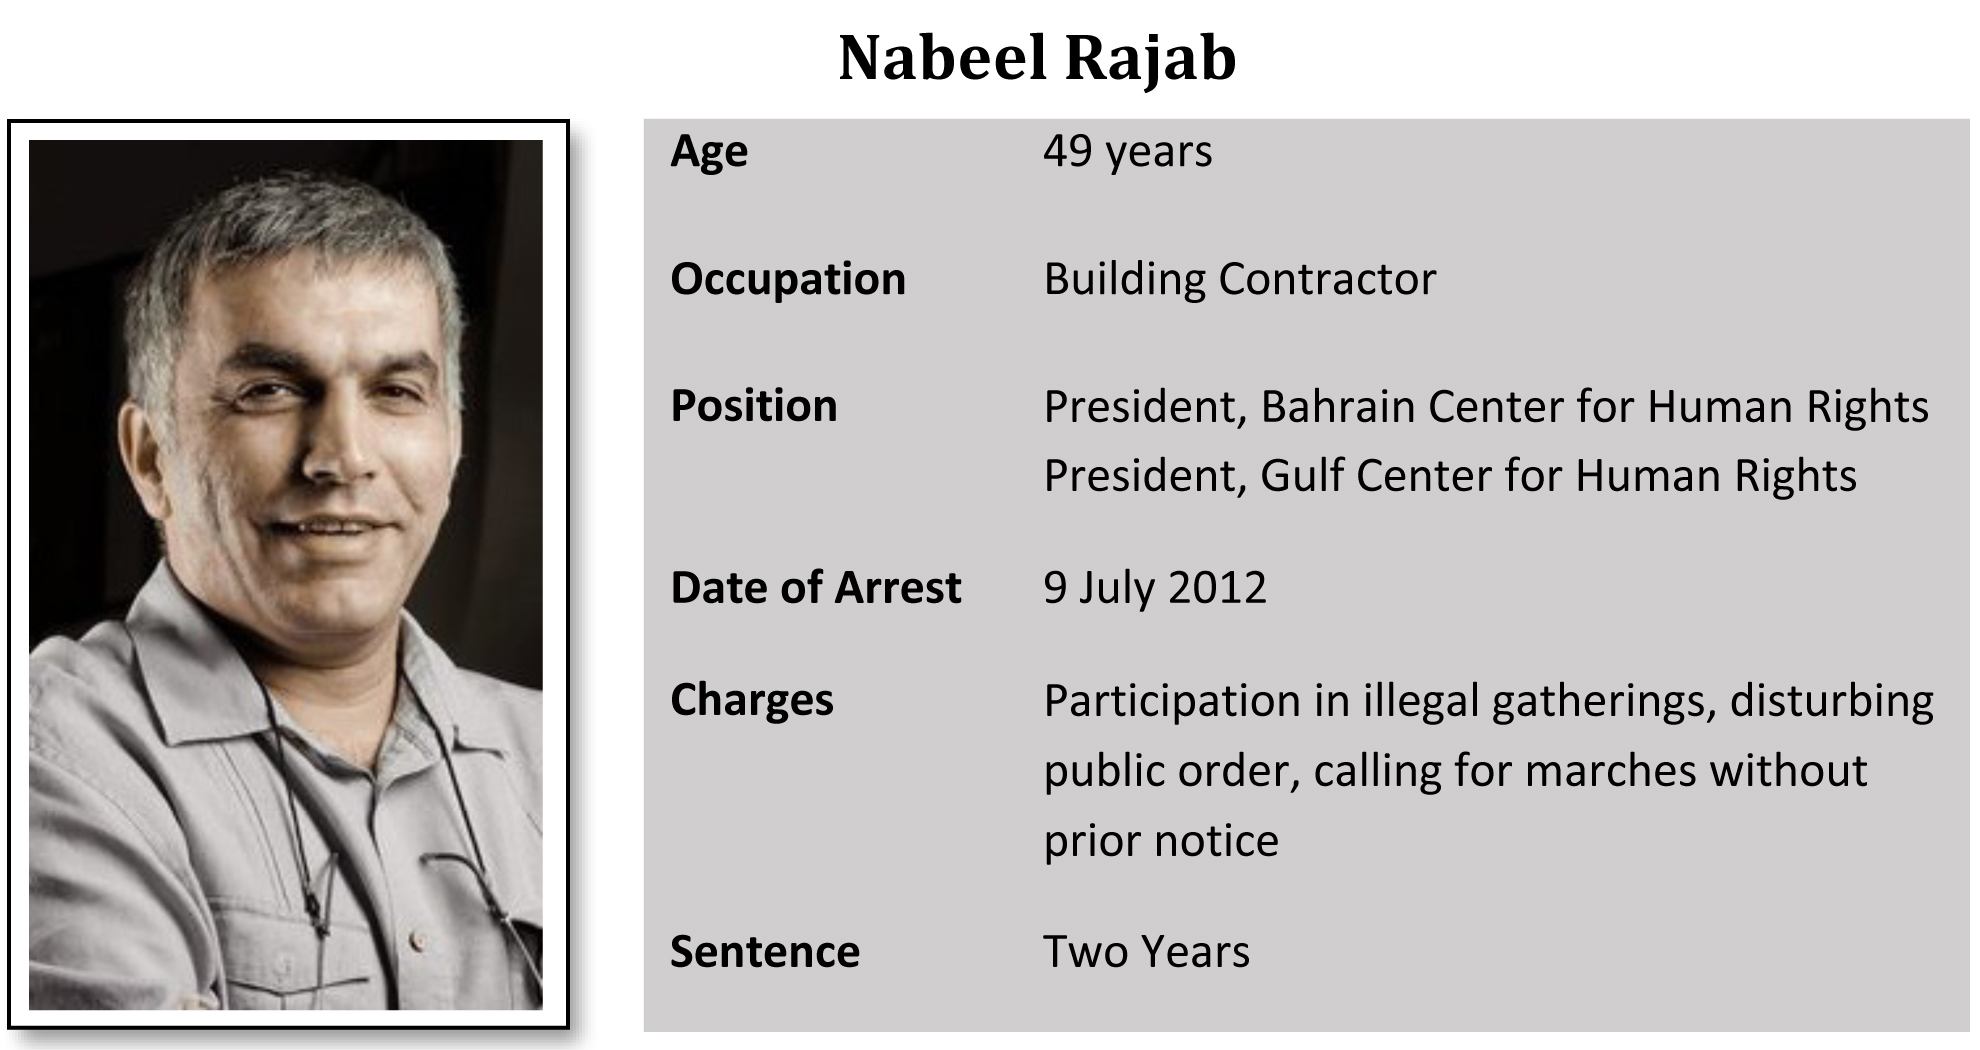 Microsoft Word - Champion for Justice - Nabeel Rajab.docx